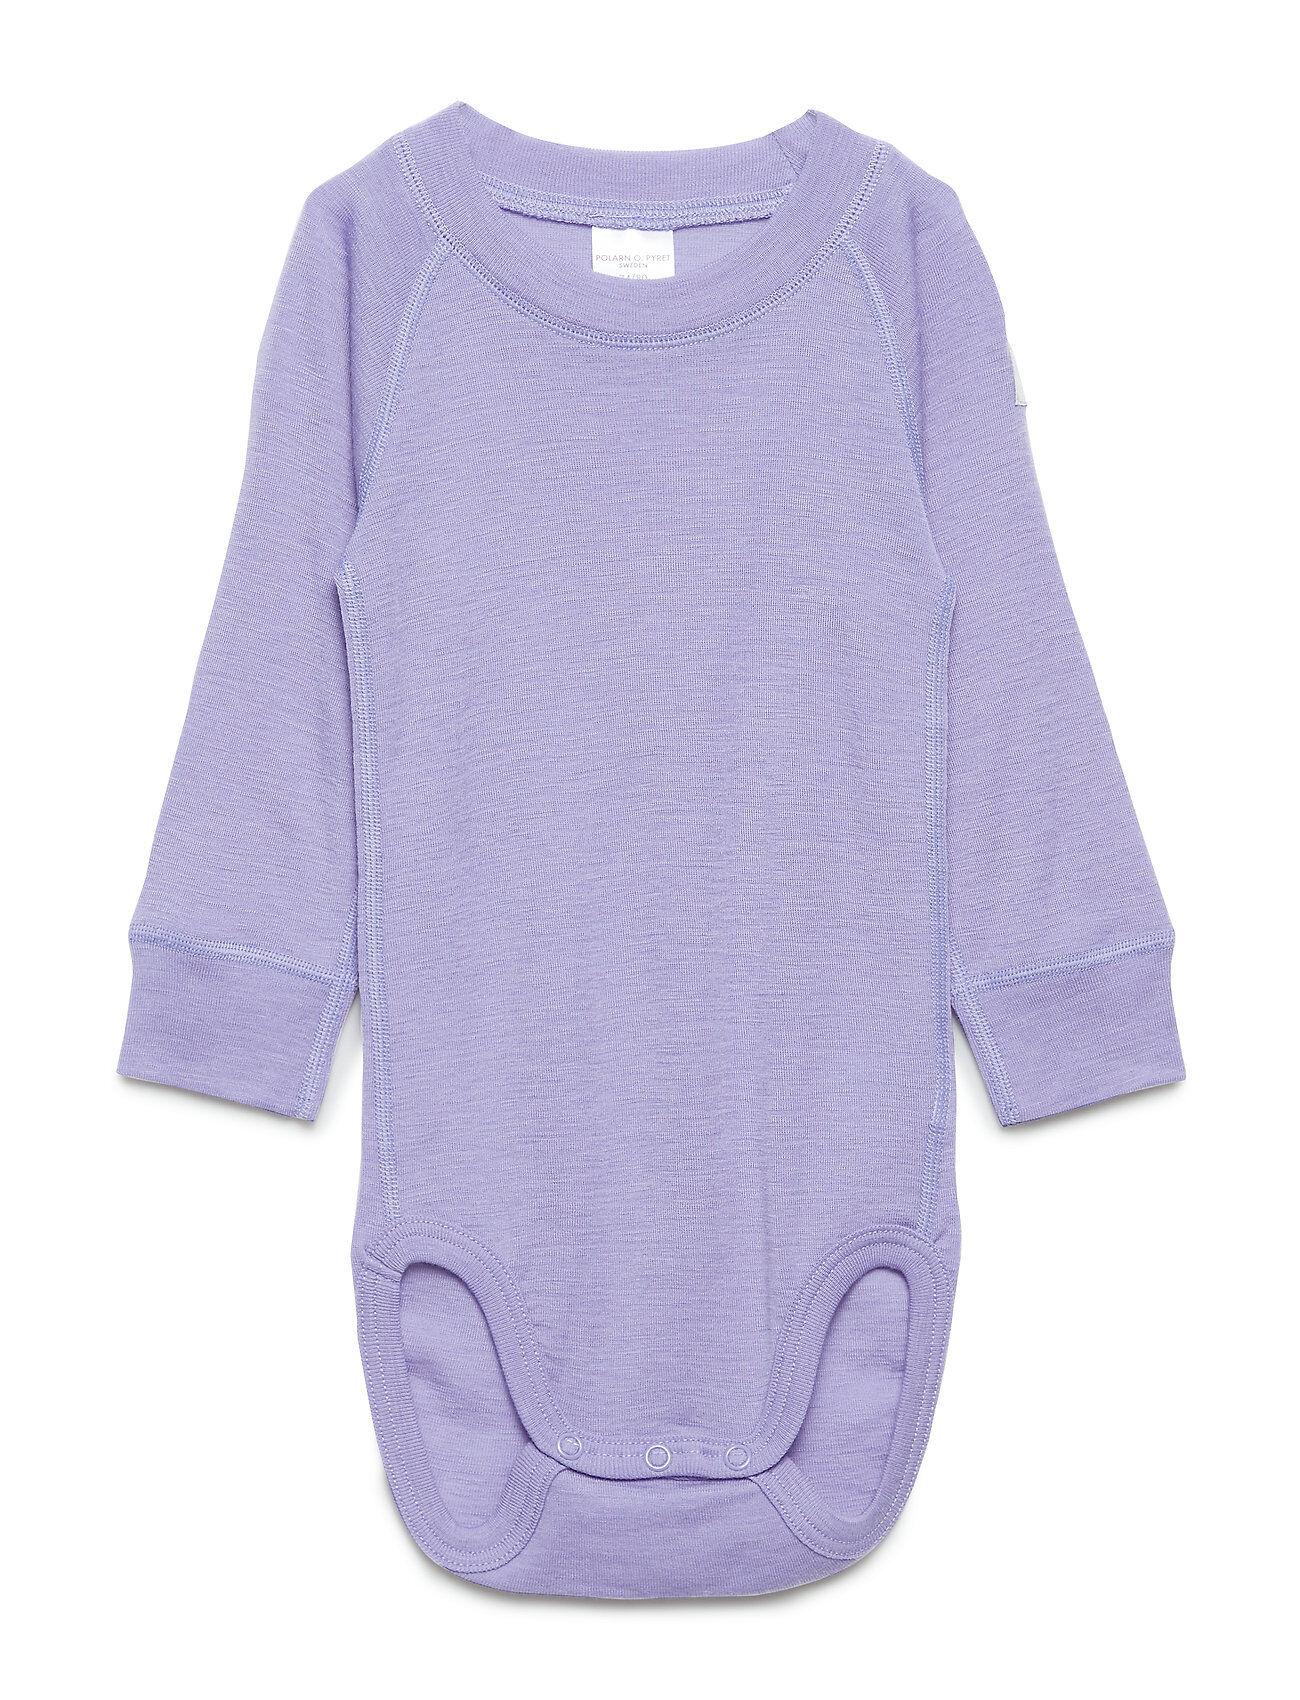 Polarn O. Pyret Body Wool Solid Baby Bodies Long-sleeved Liila Polarn O. Pyret